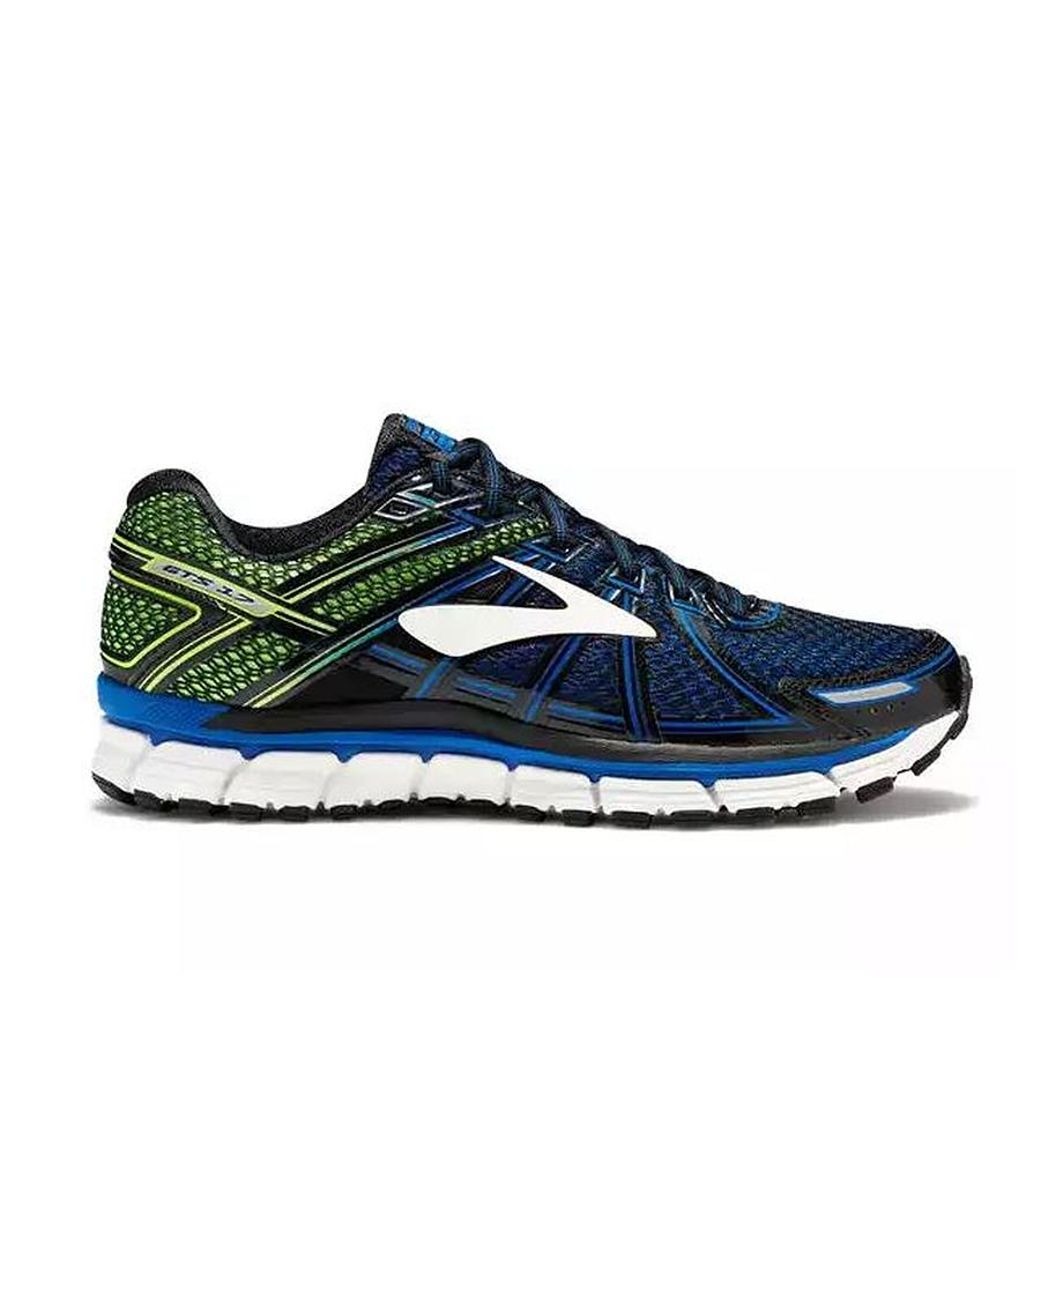 c91c6b2757d Lyst - Brooks Adrenaline Gts 17 Running Shoe in Blue for Men